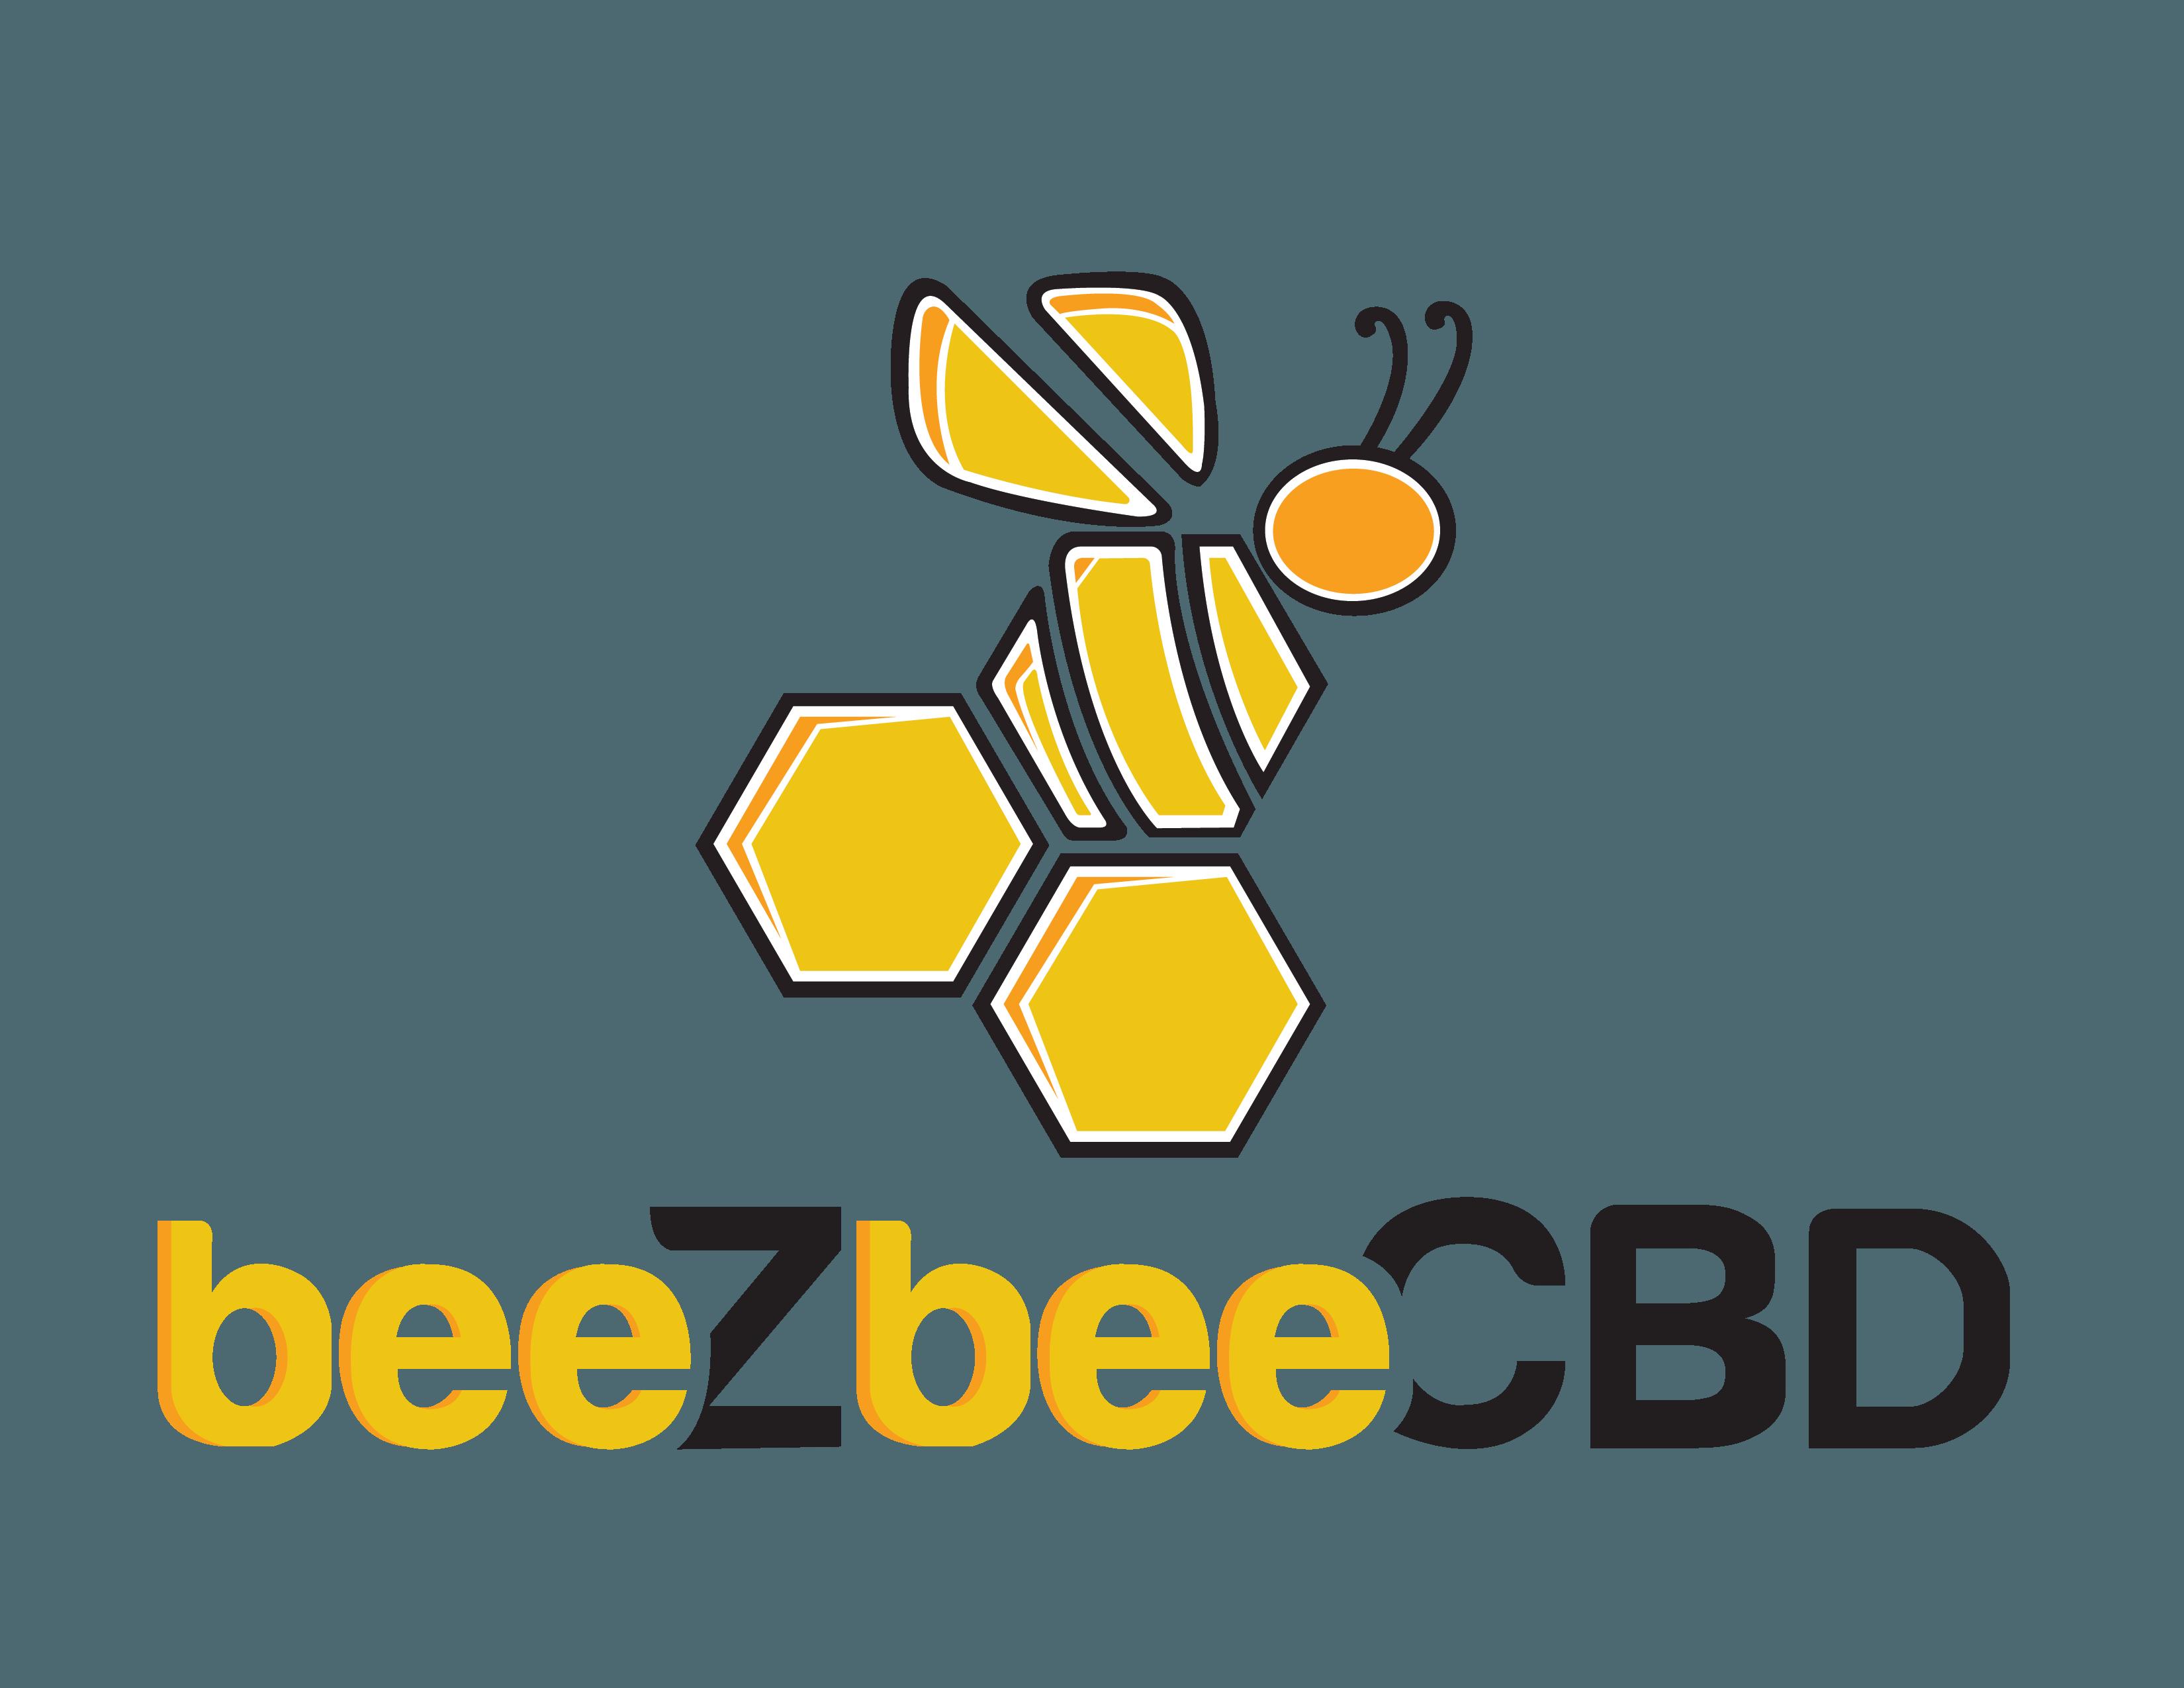 find beezbee products beezbeecbd. Black Bedroom Furniture Sets. Home Design Ideas